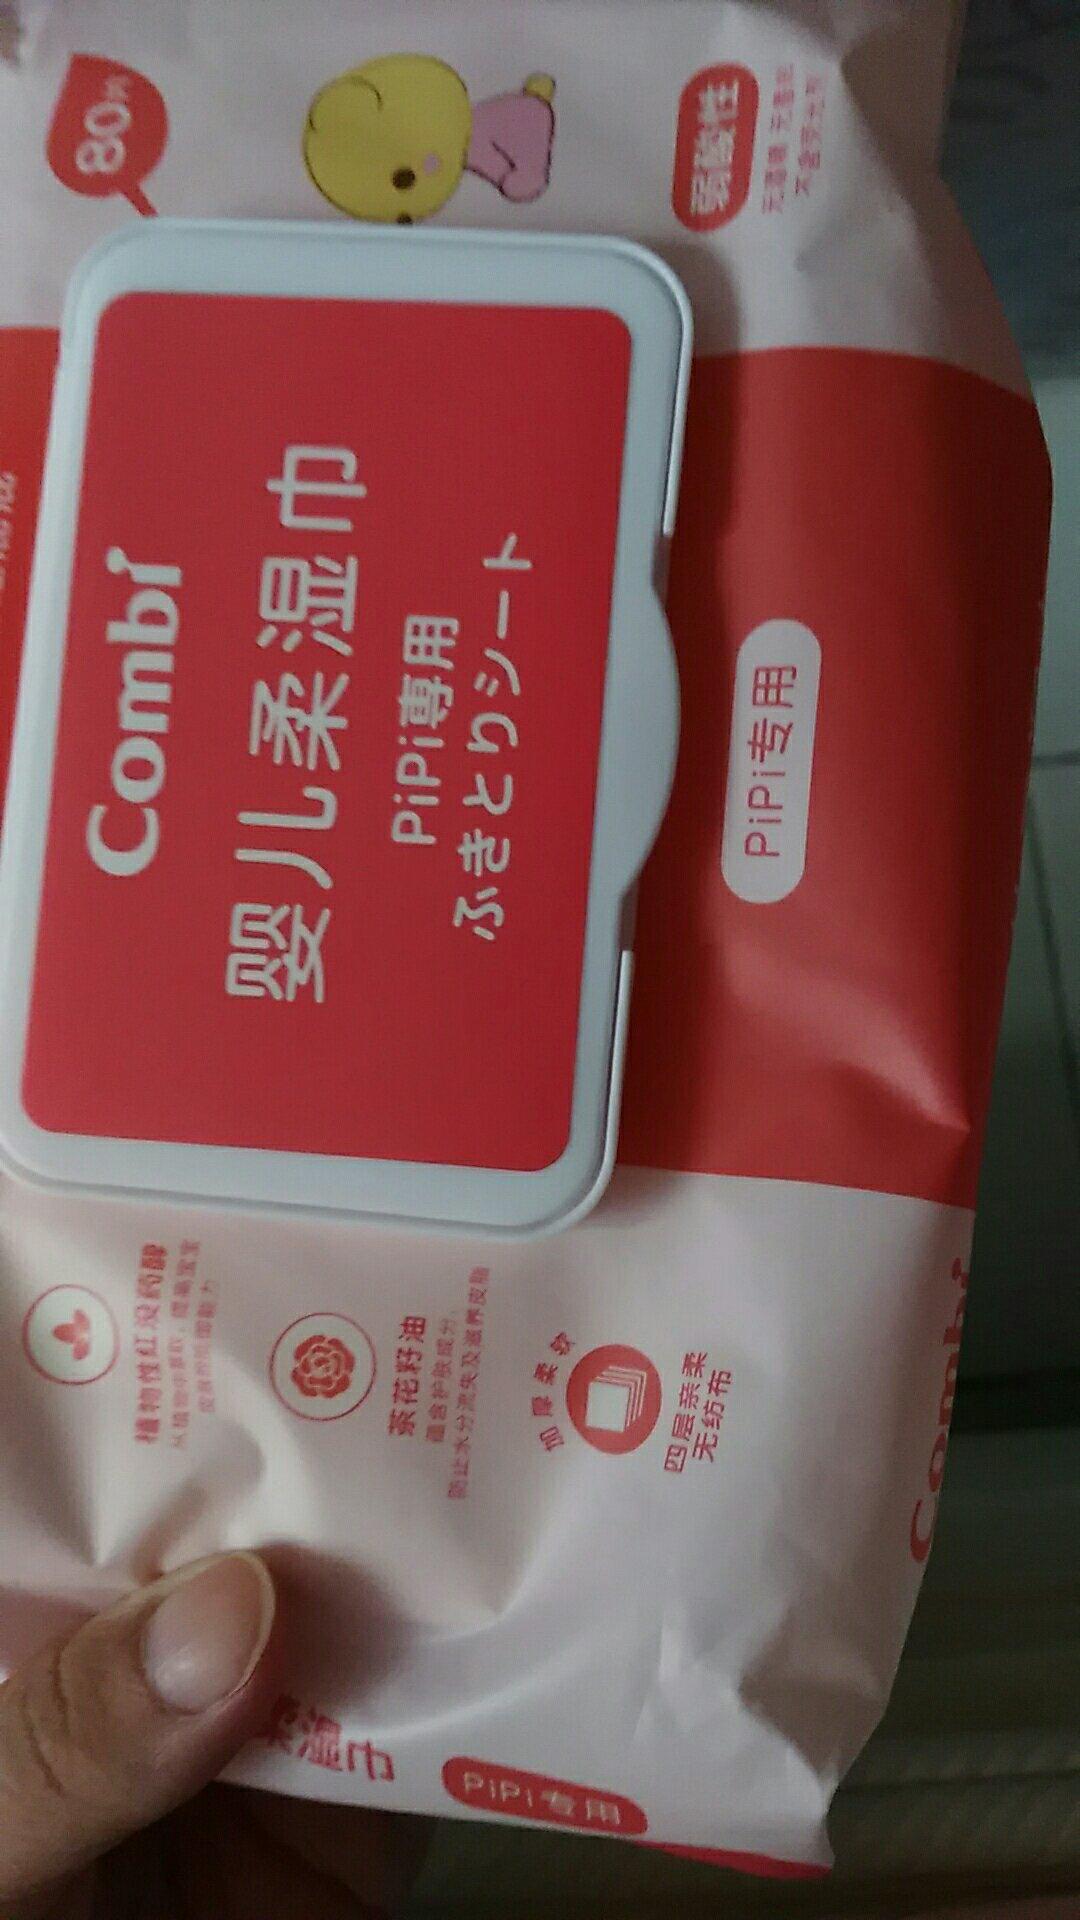 jordan retro 13 release 2012 00249873 online